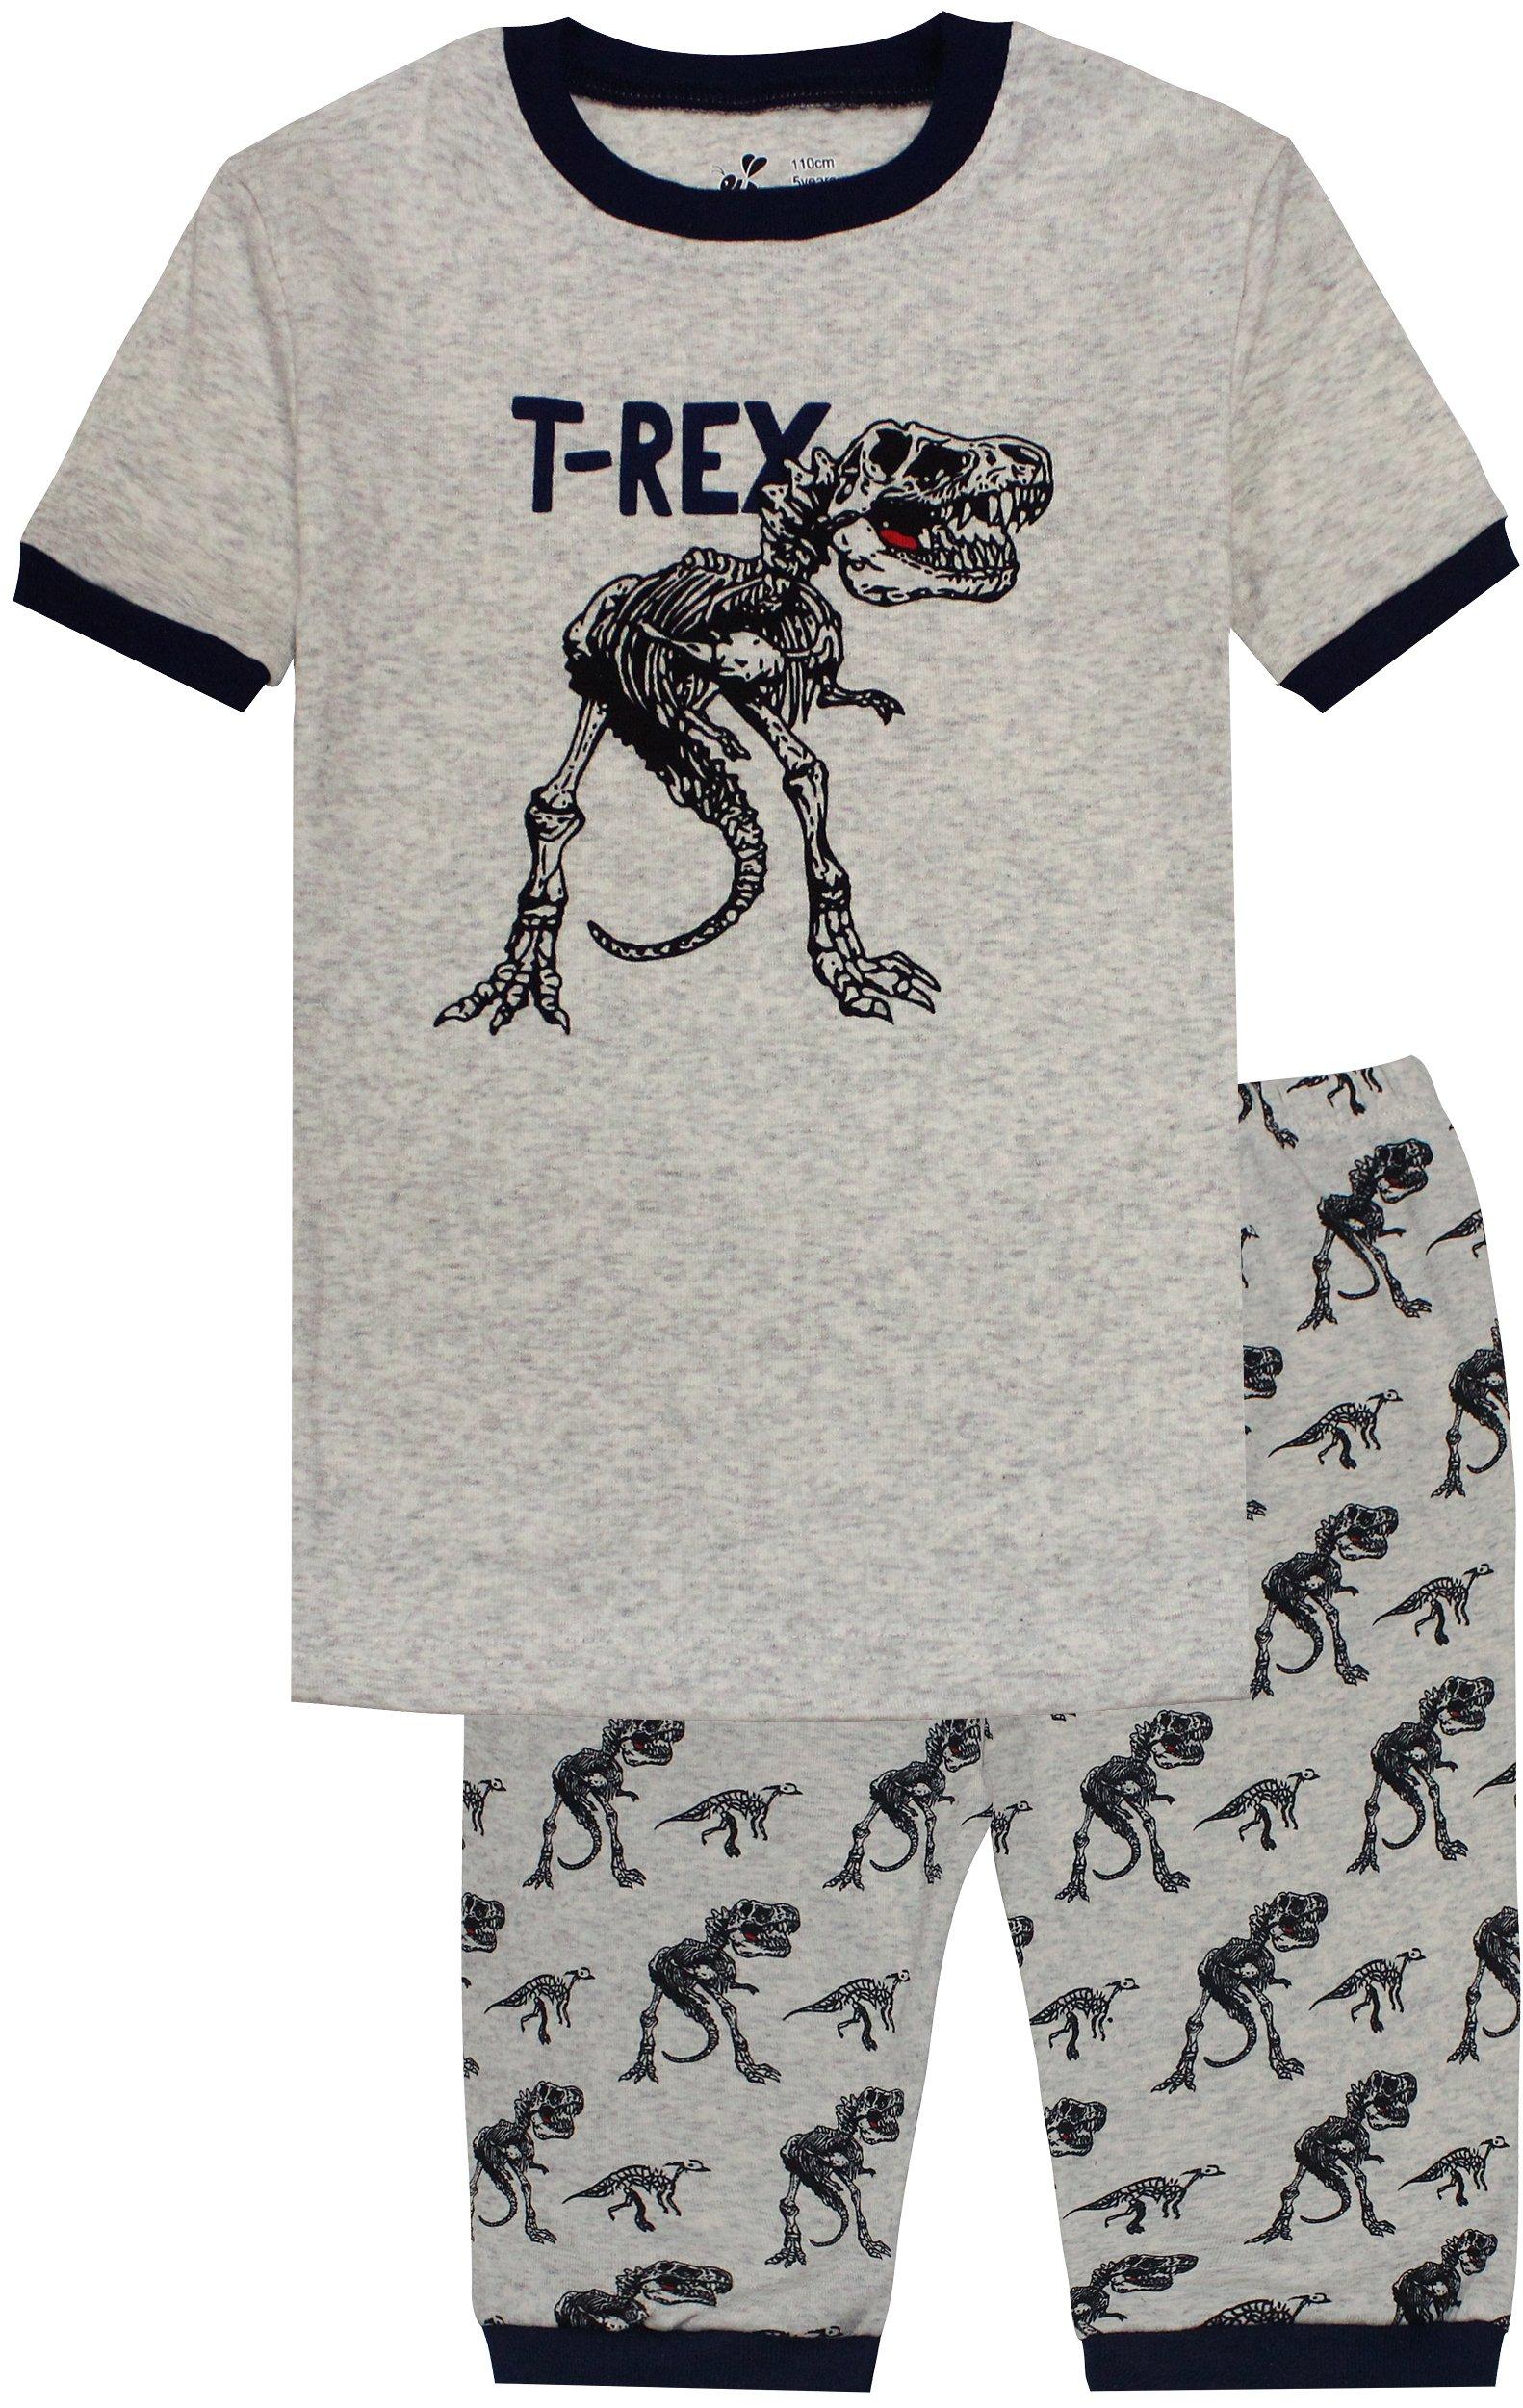 Boys T-Rex Pajamas Kids Sleep Shorts Set Cartoon Children Summer Clothes